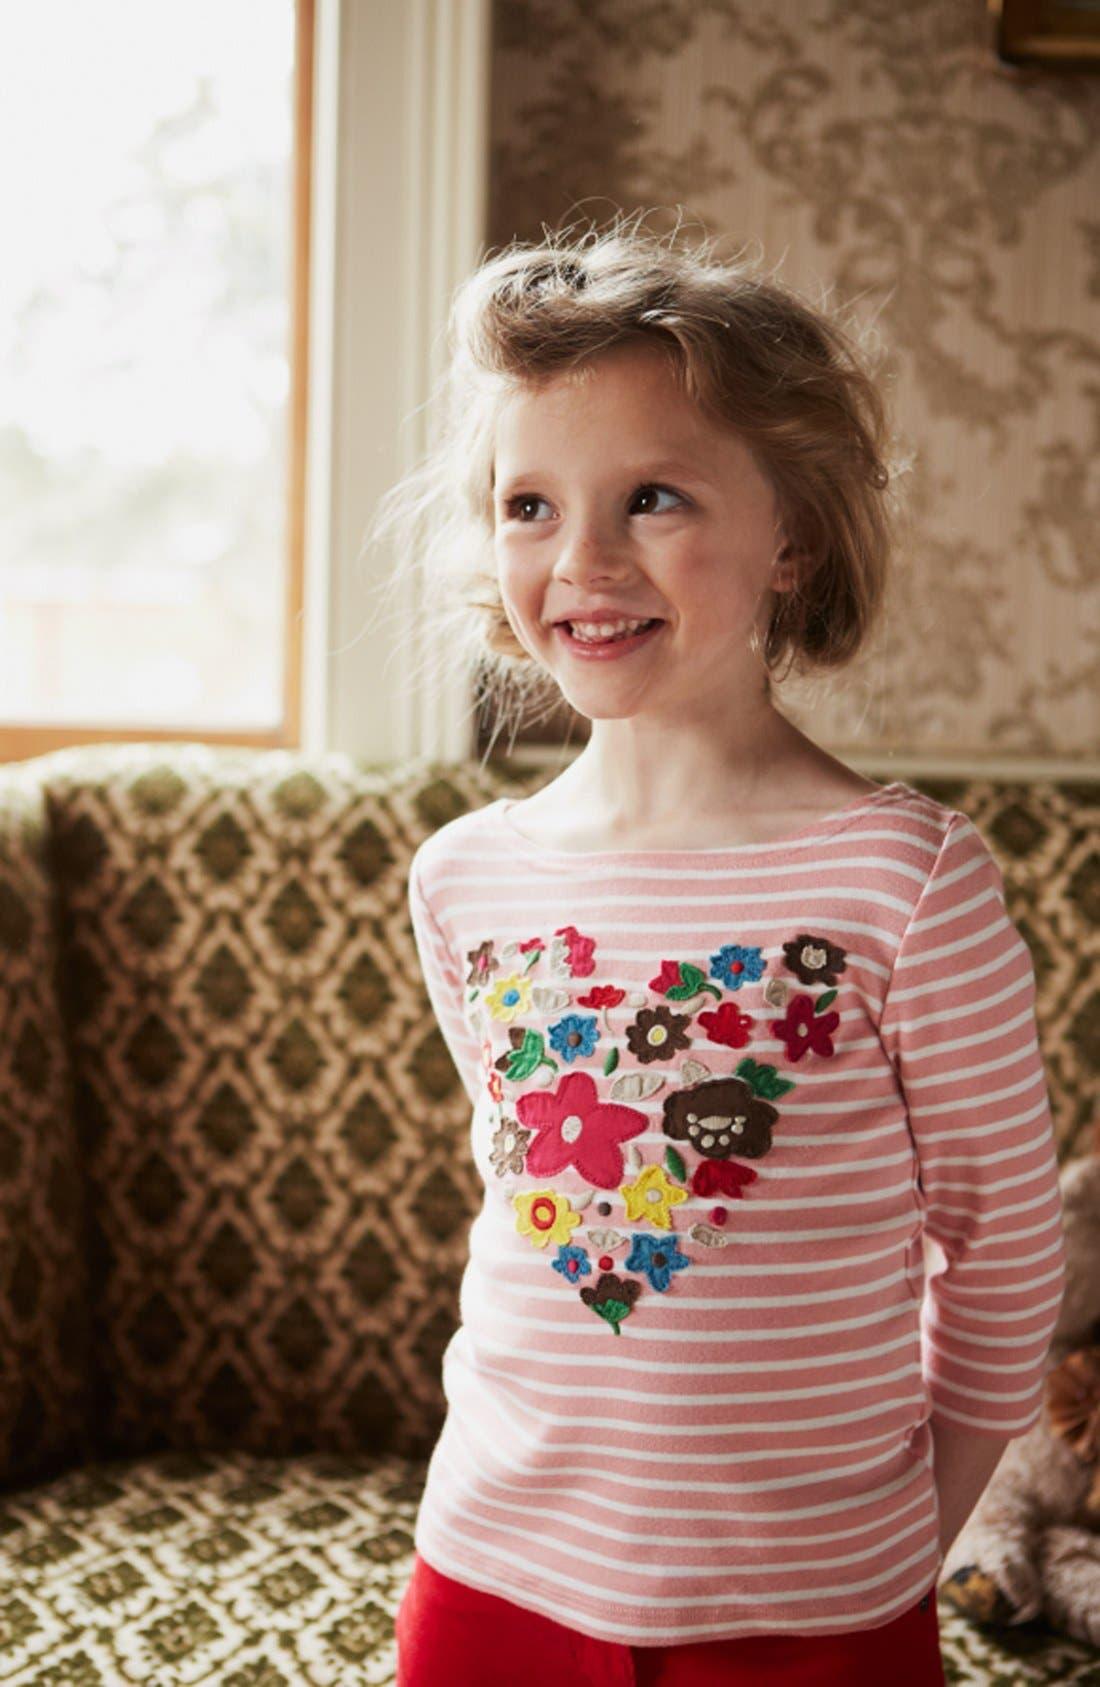 Alternate Image 2  - Mini Boden 'Big Bloom' Appliqué Tee (Toddler Girls, Little Girls & Big Girls)